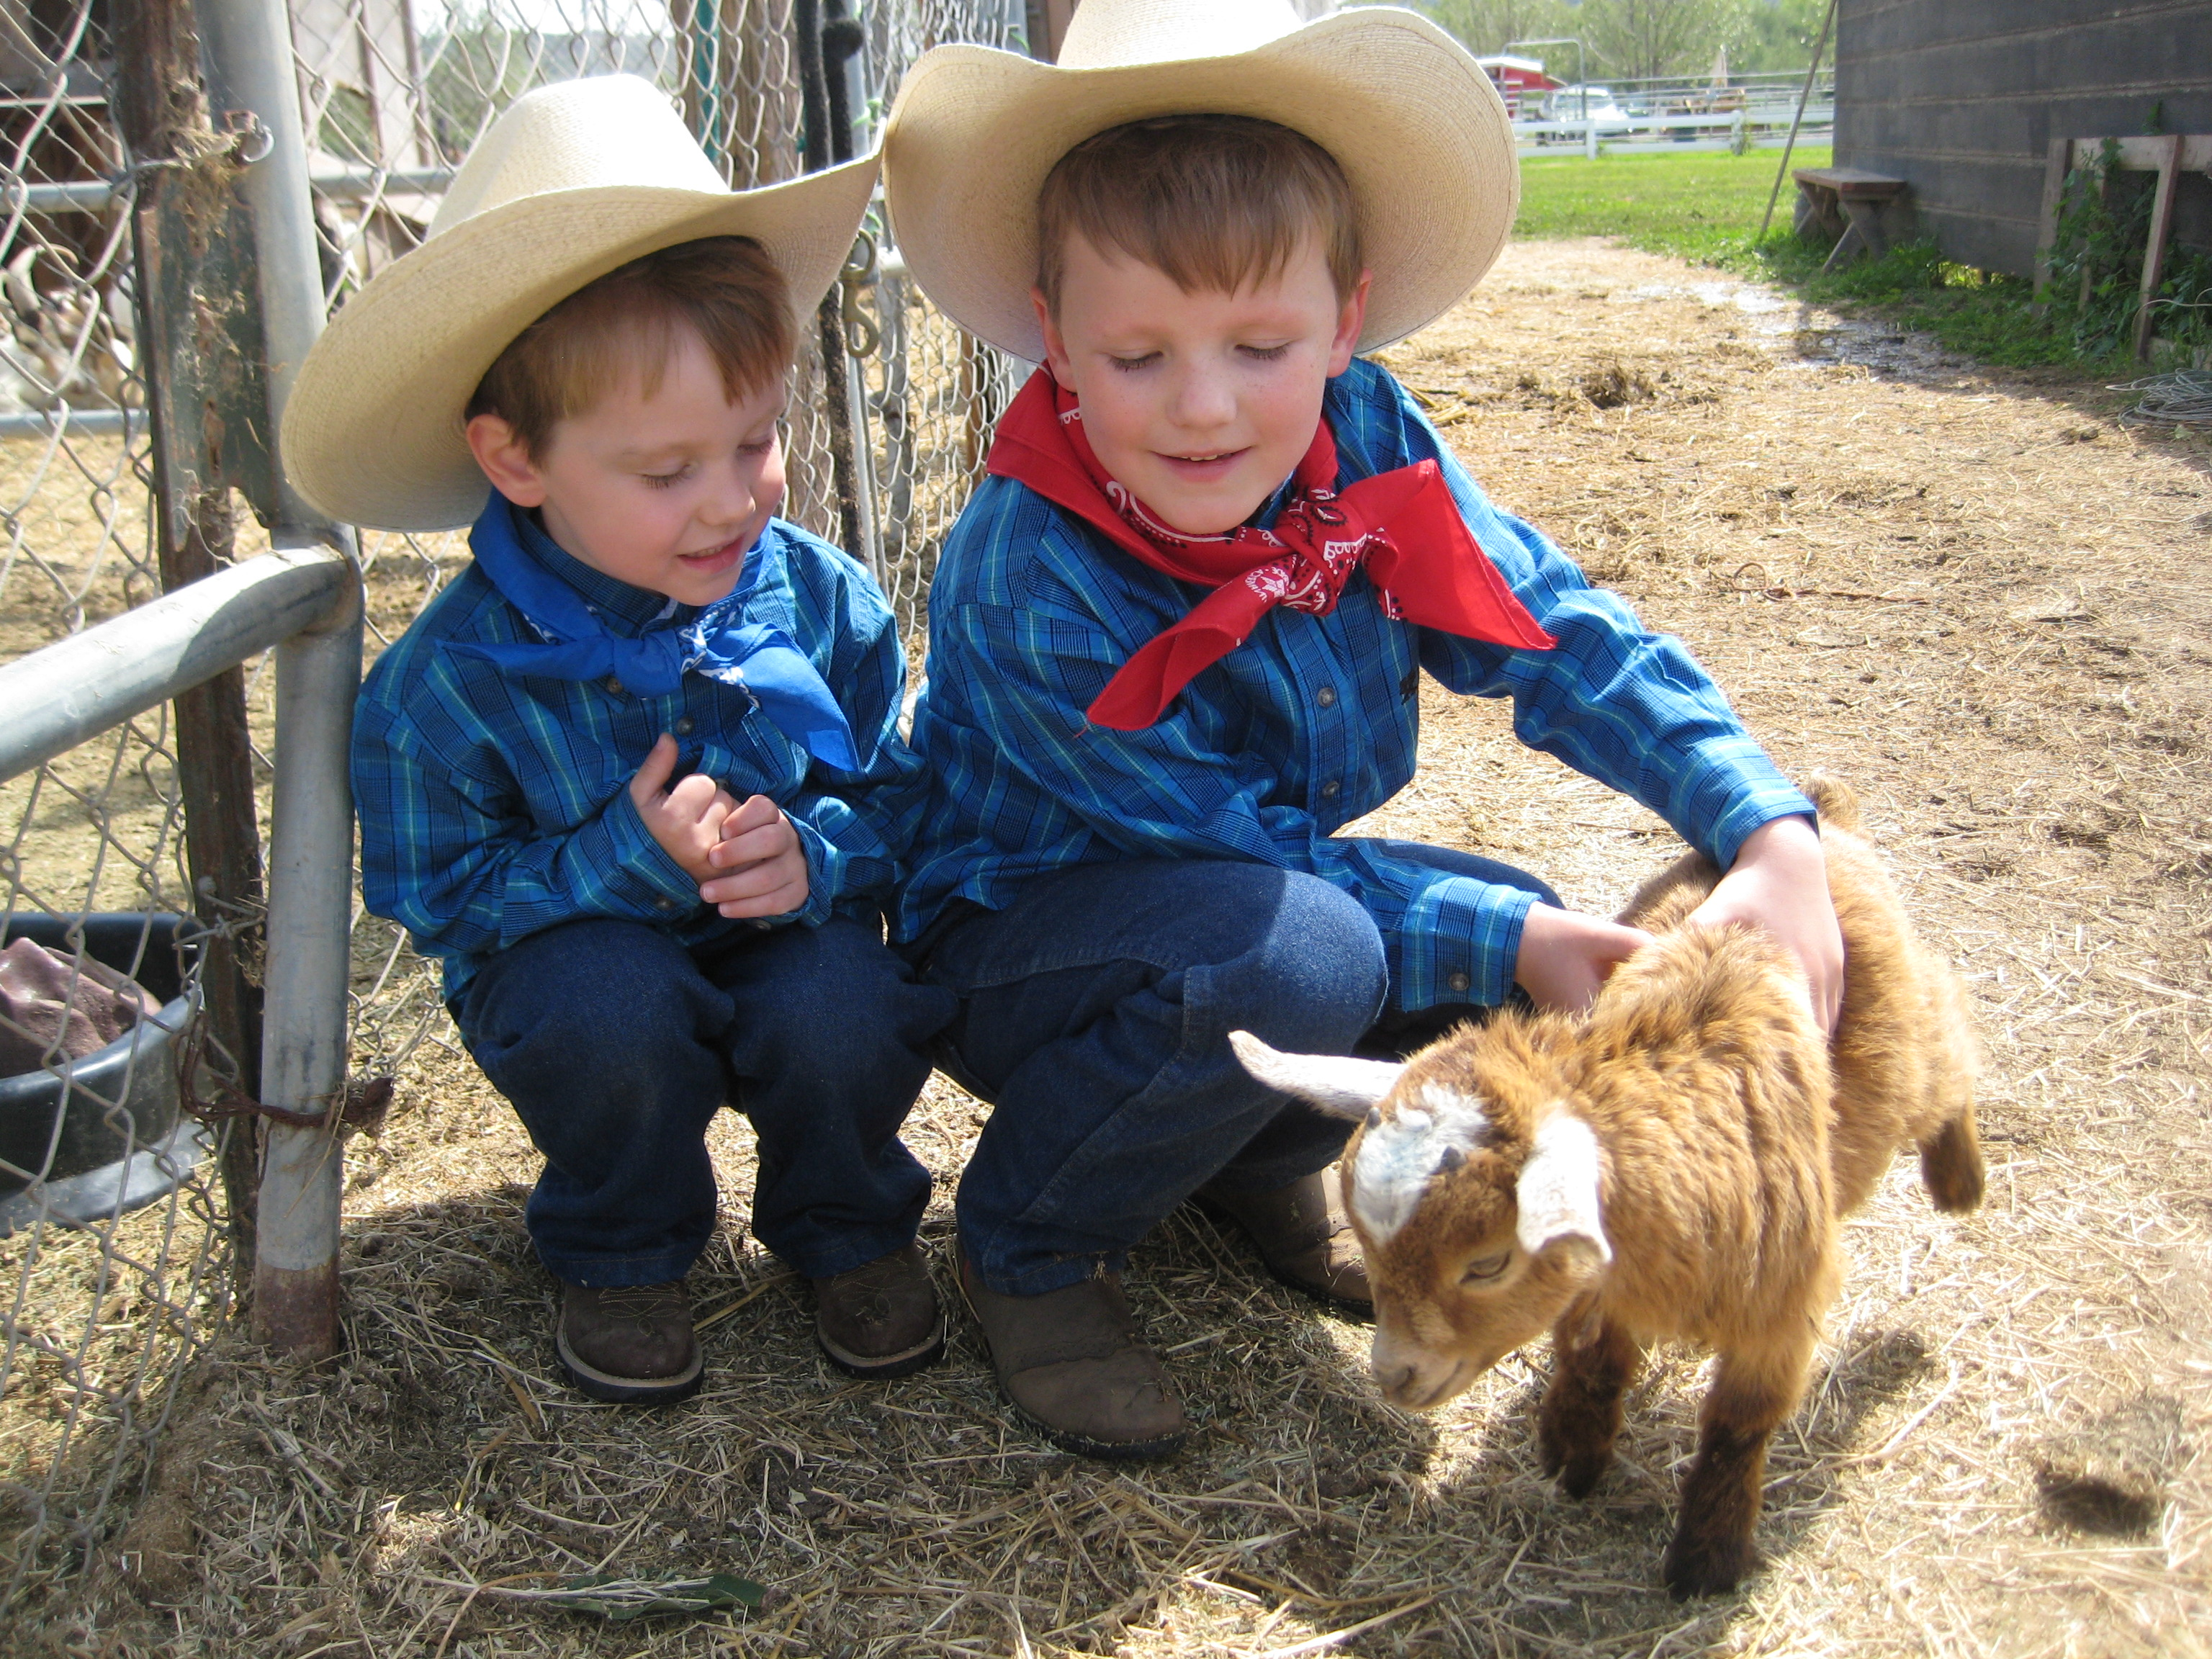 Petting Baby Goats